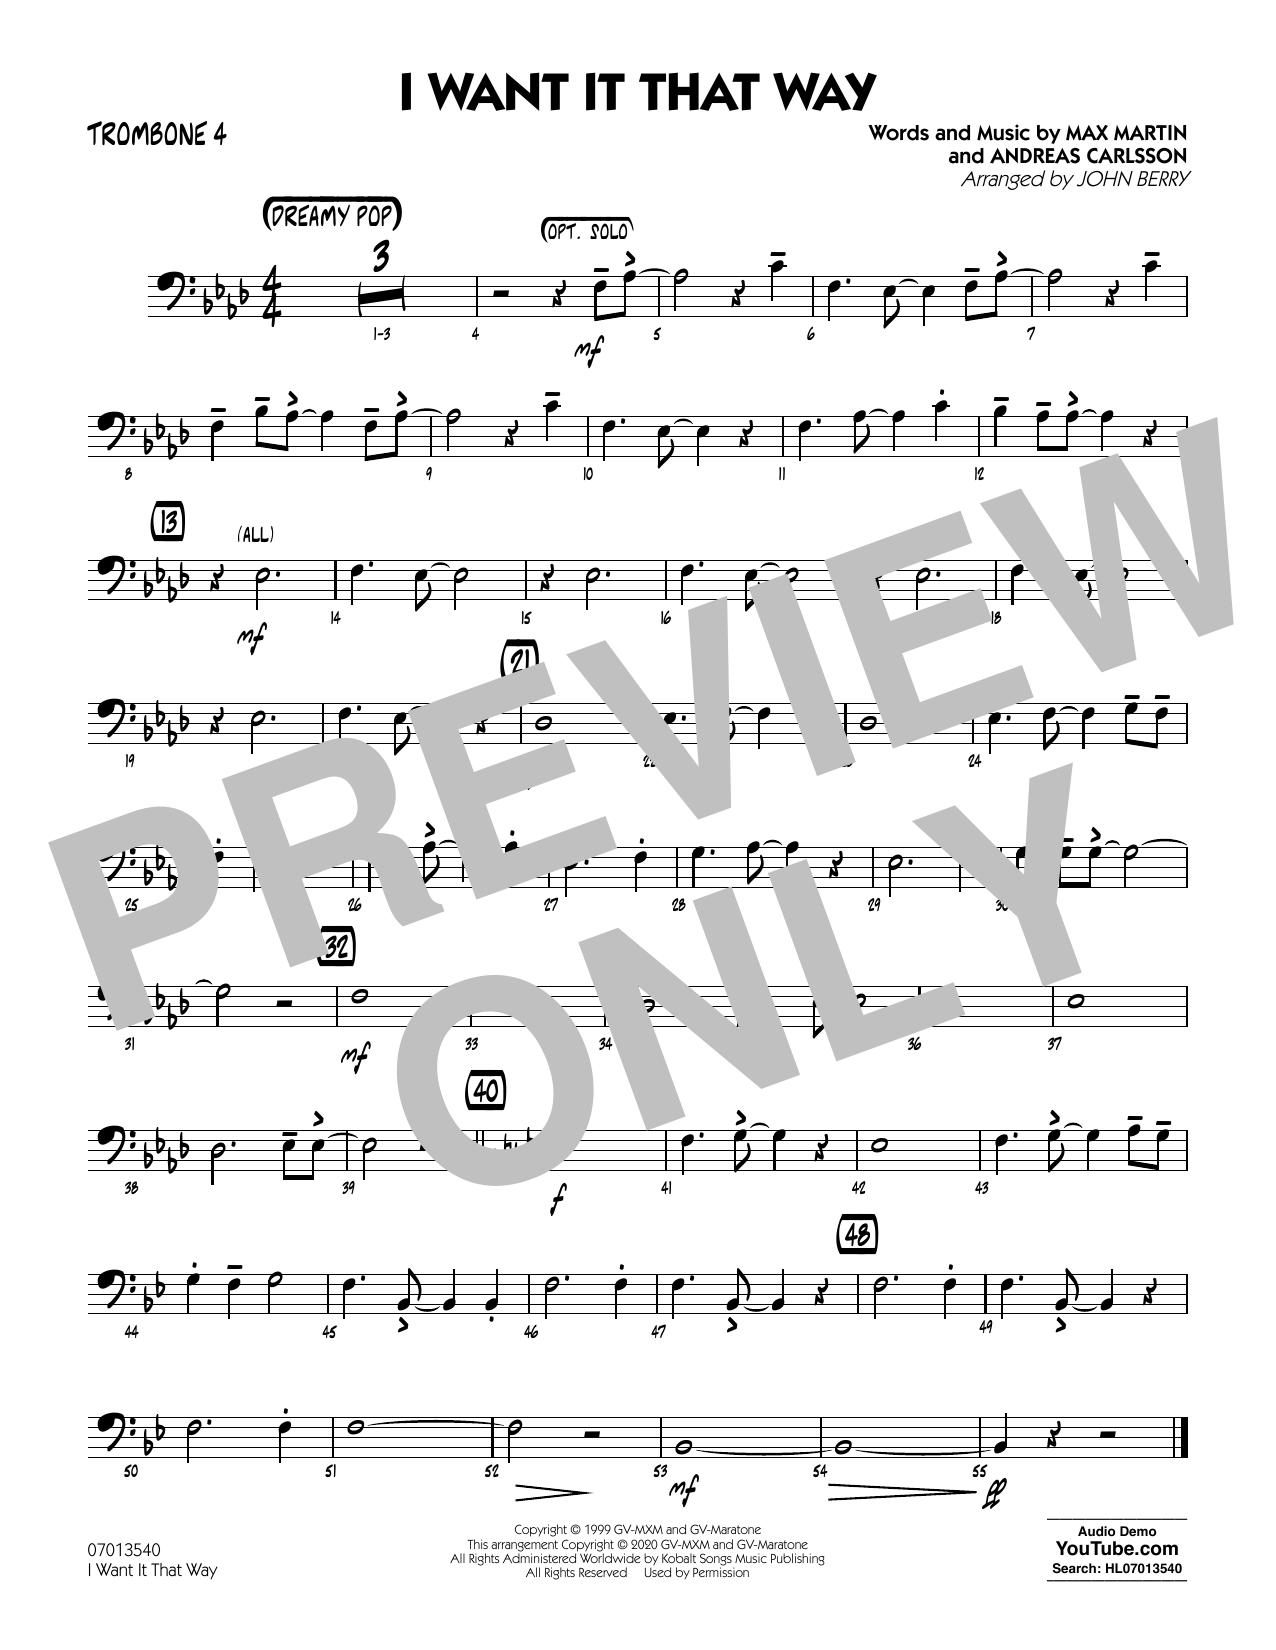 I Want It That Way (arr. John Berry) - Trombone 4 Sheet Music